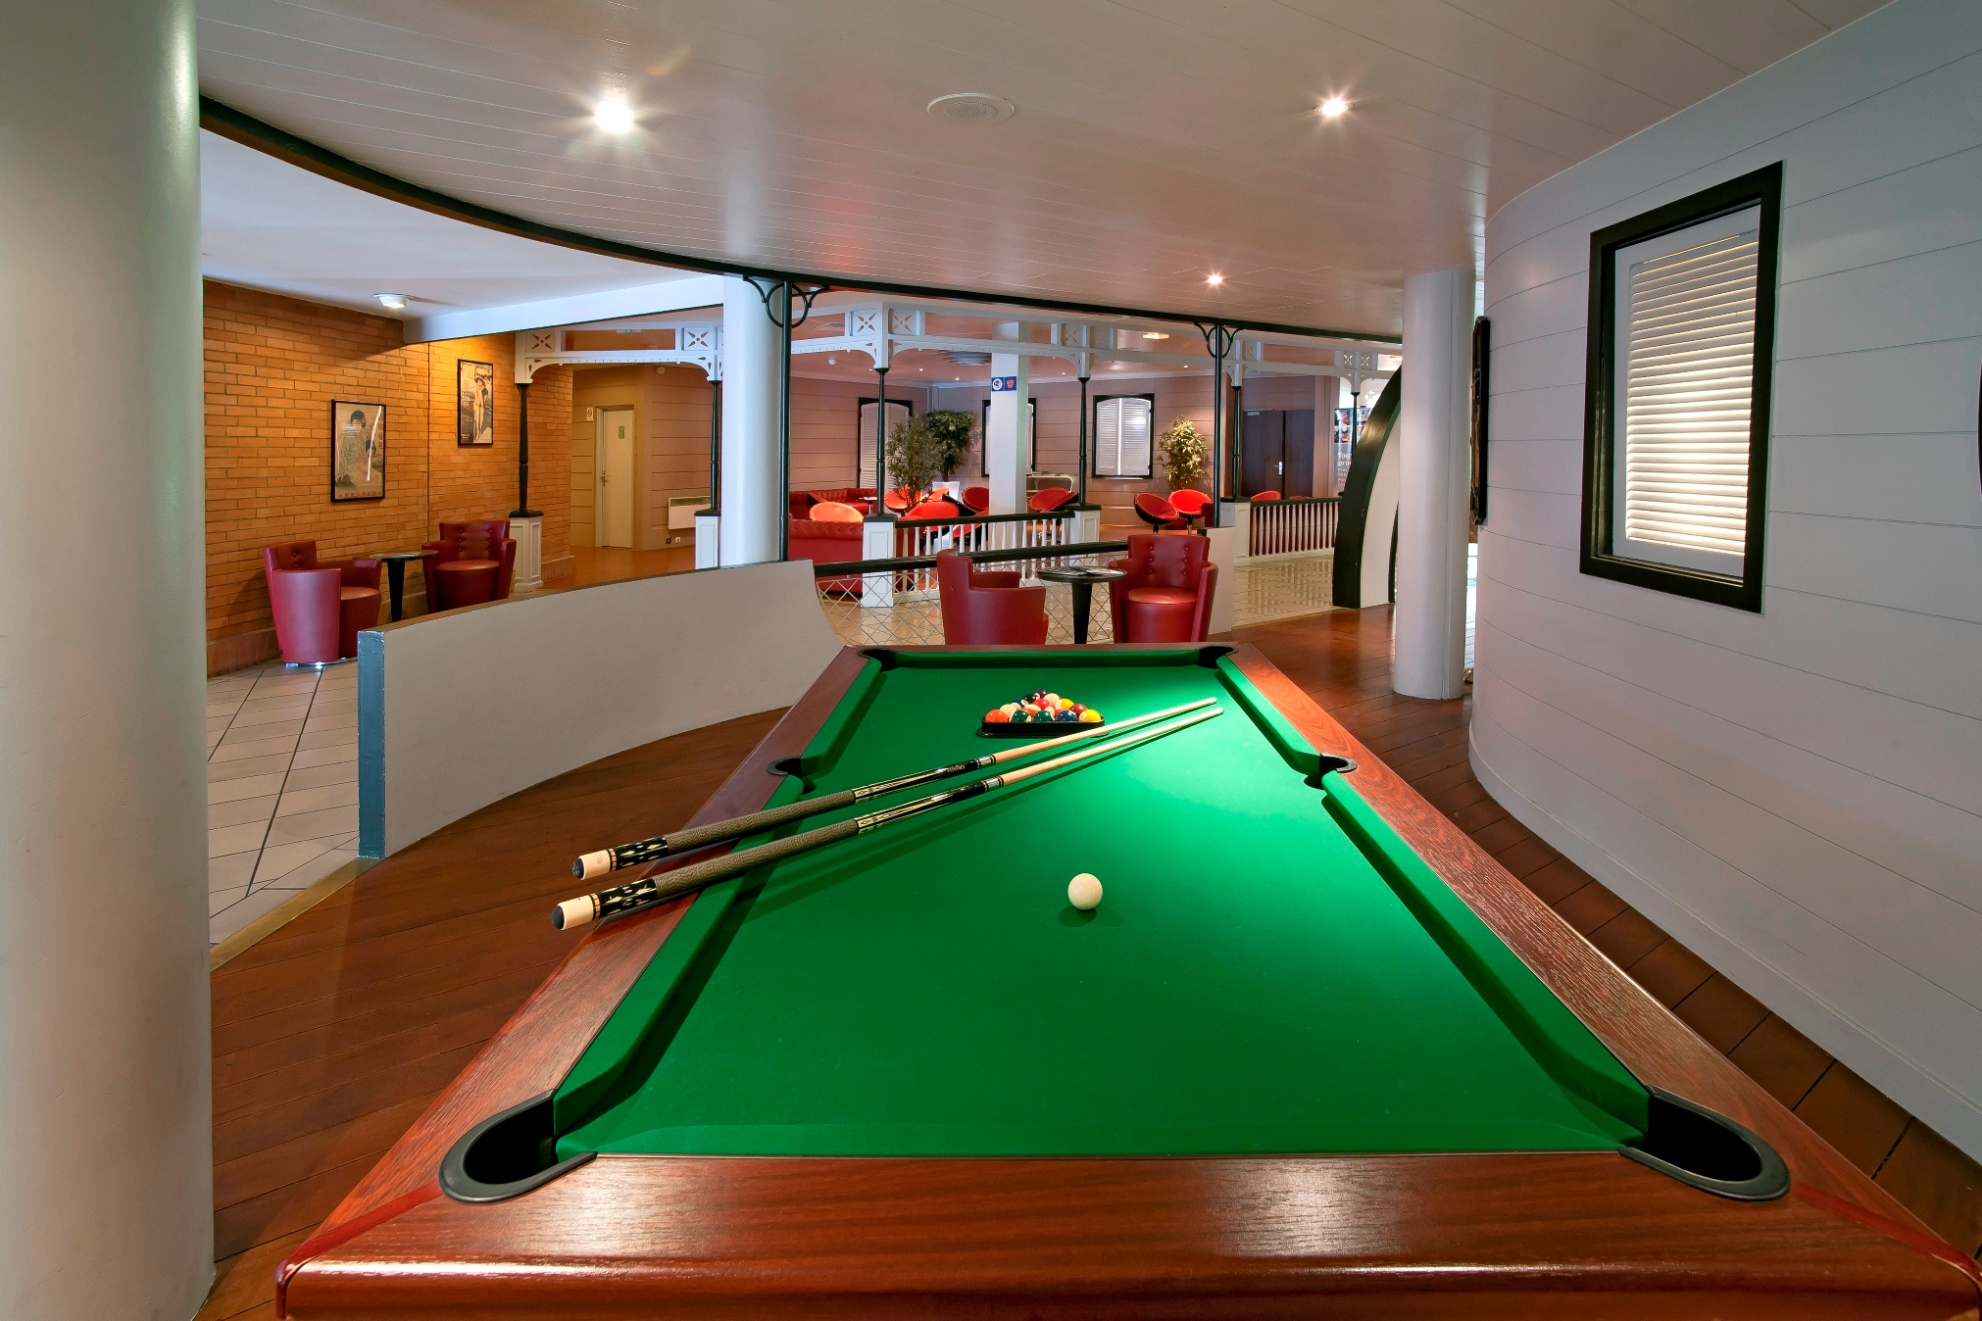 Bowling Rosny Sous Bois - Qualys Hotel Golf Paris Est (Rosny sous Bois) Hotel Reviews, Photos, Rate Comparison TripAdvisor